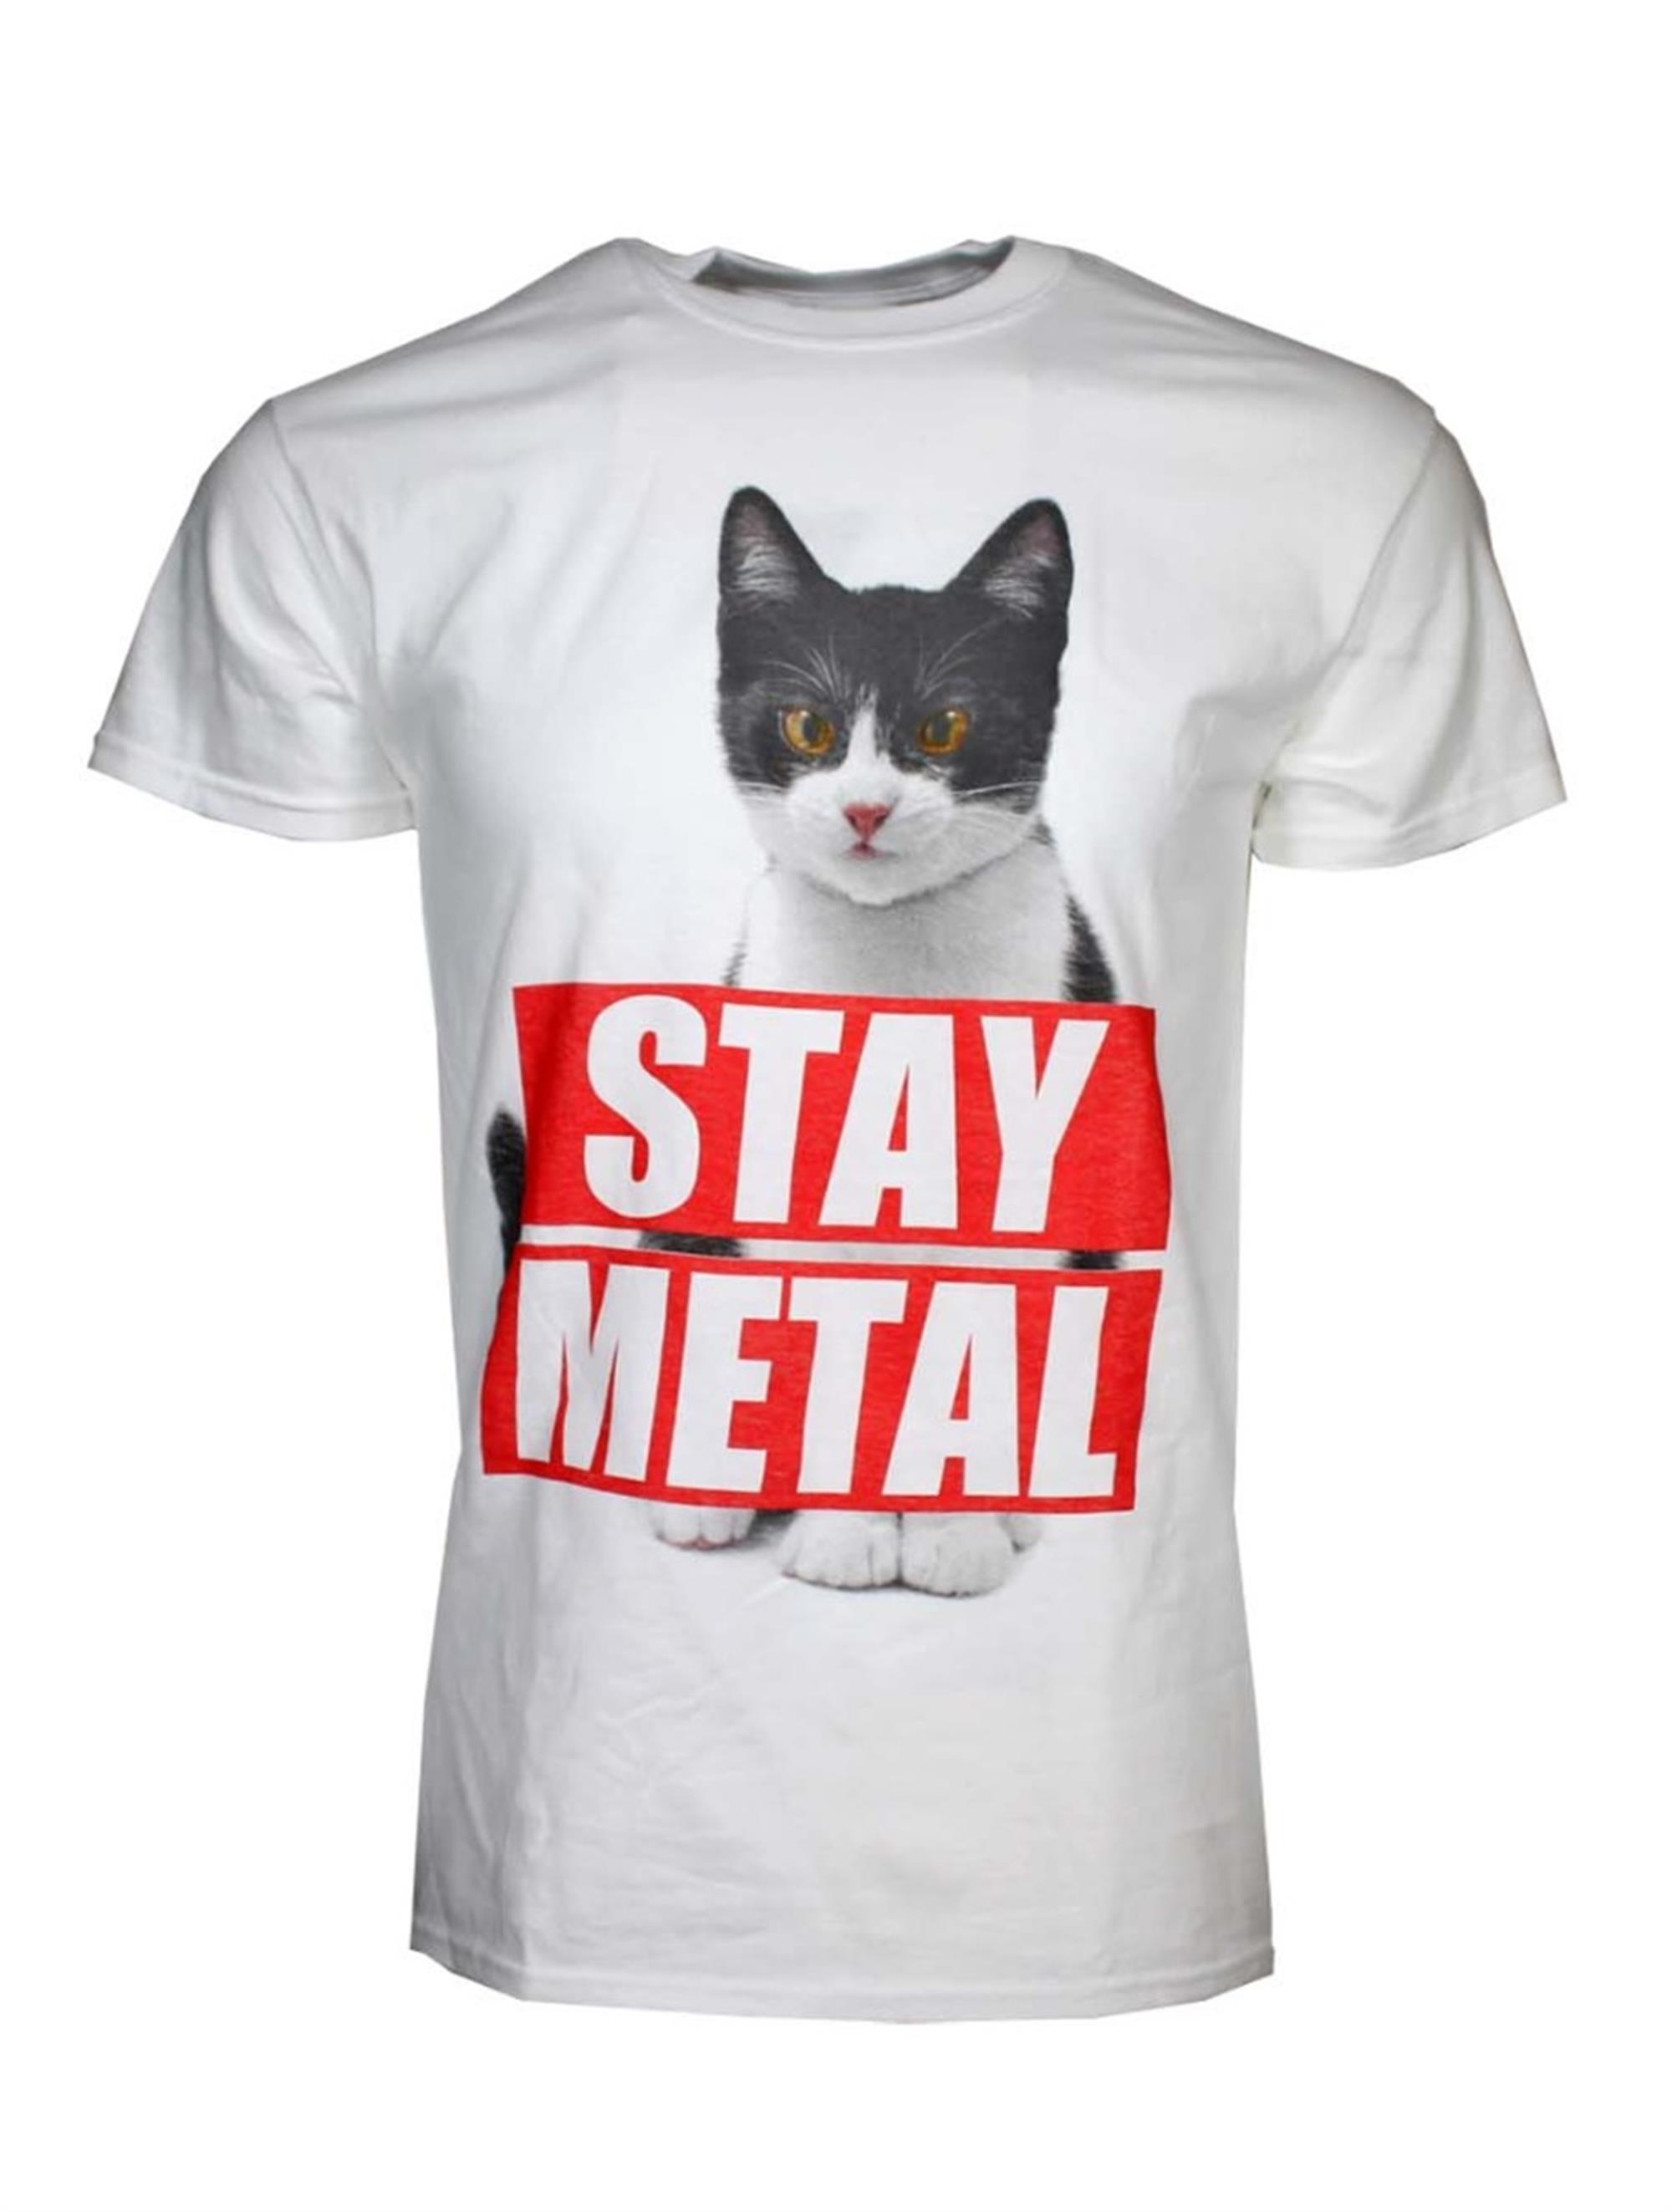 Miss May I Stay Metal Cat T-Shirt